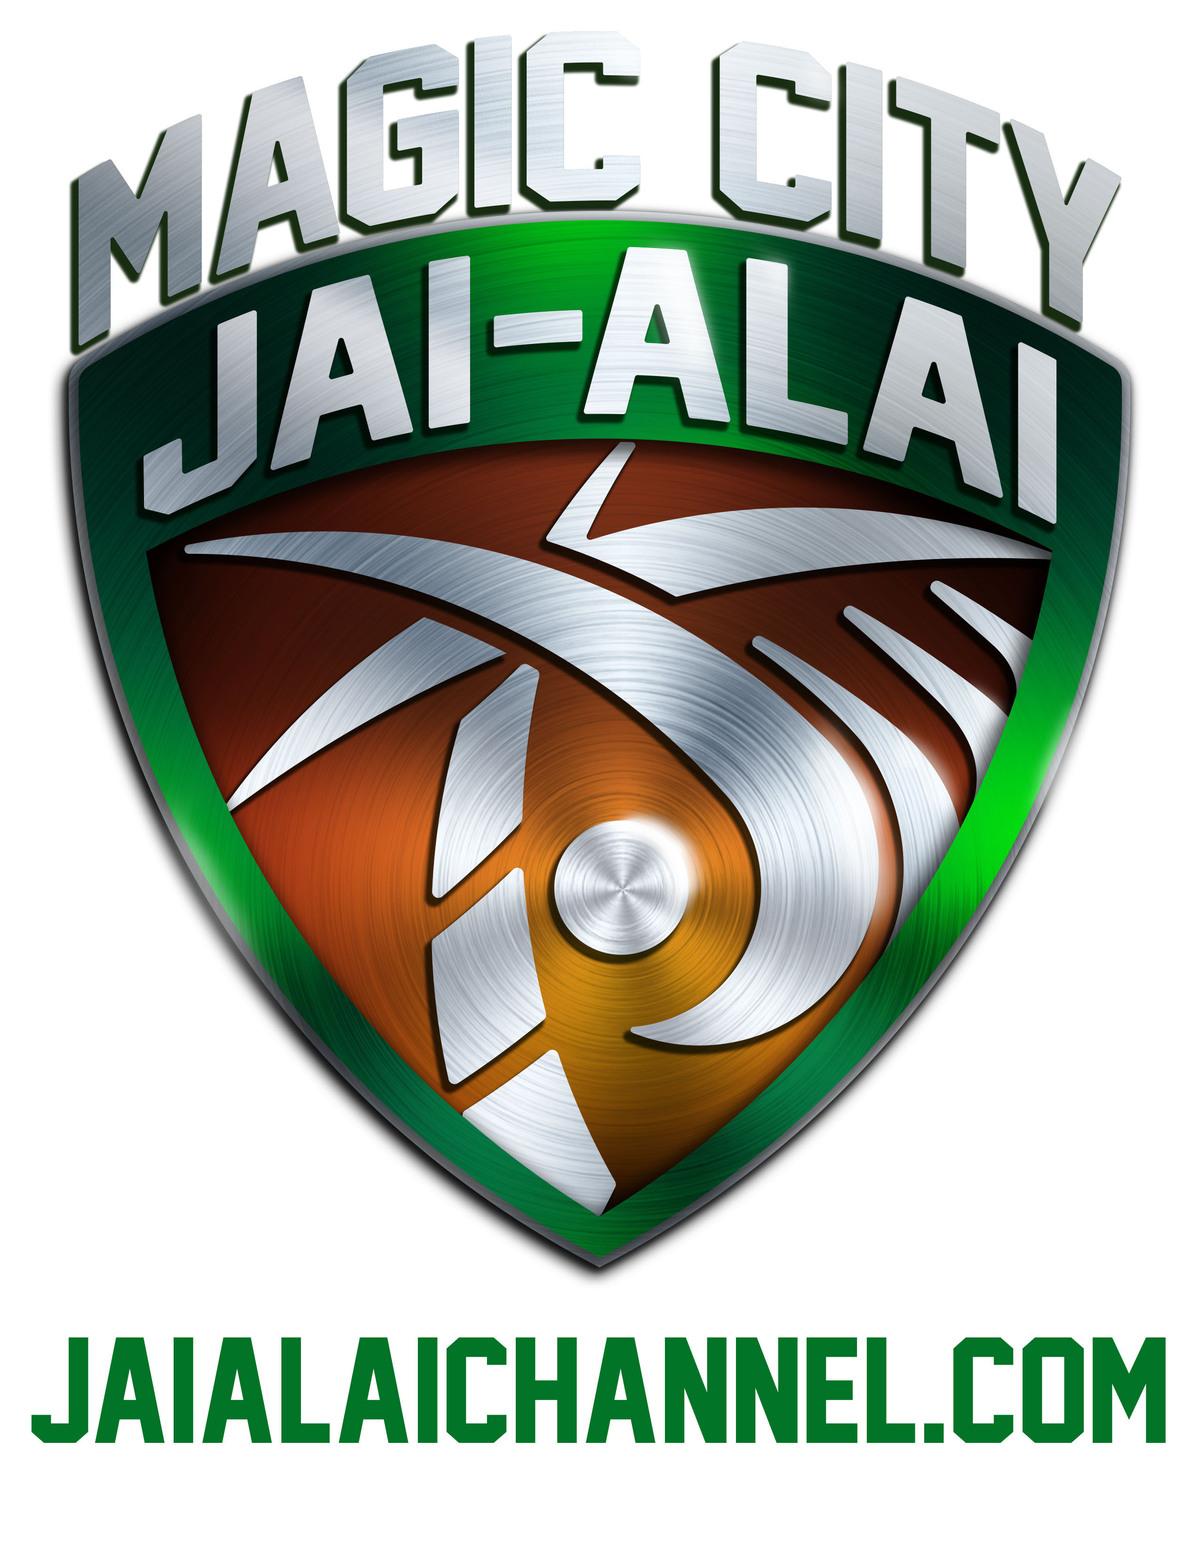 Jai-Alai H2H - Doubles H2H - Sat. Jun 12, 2021